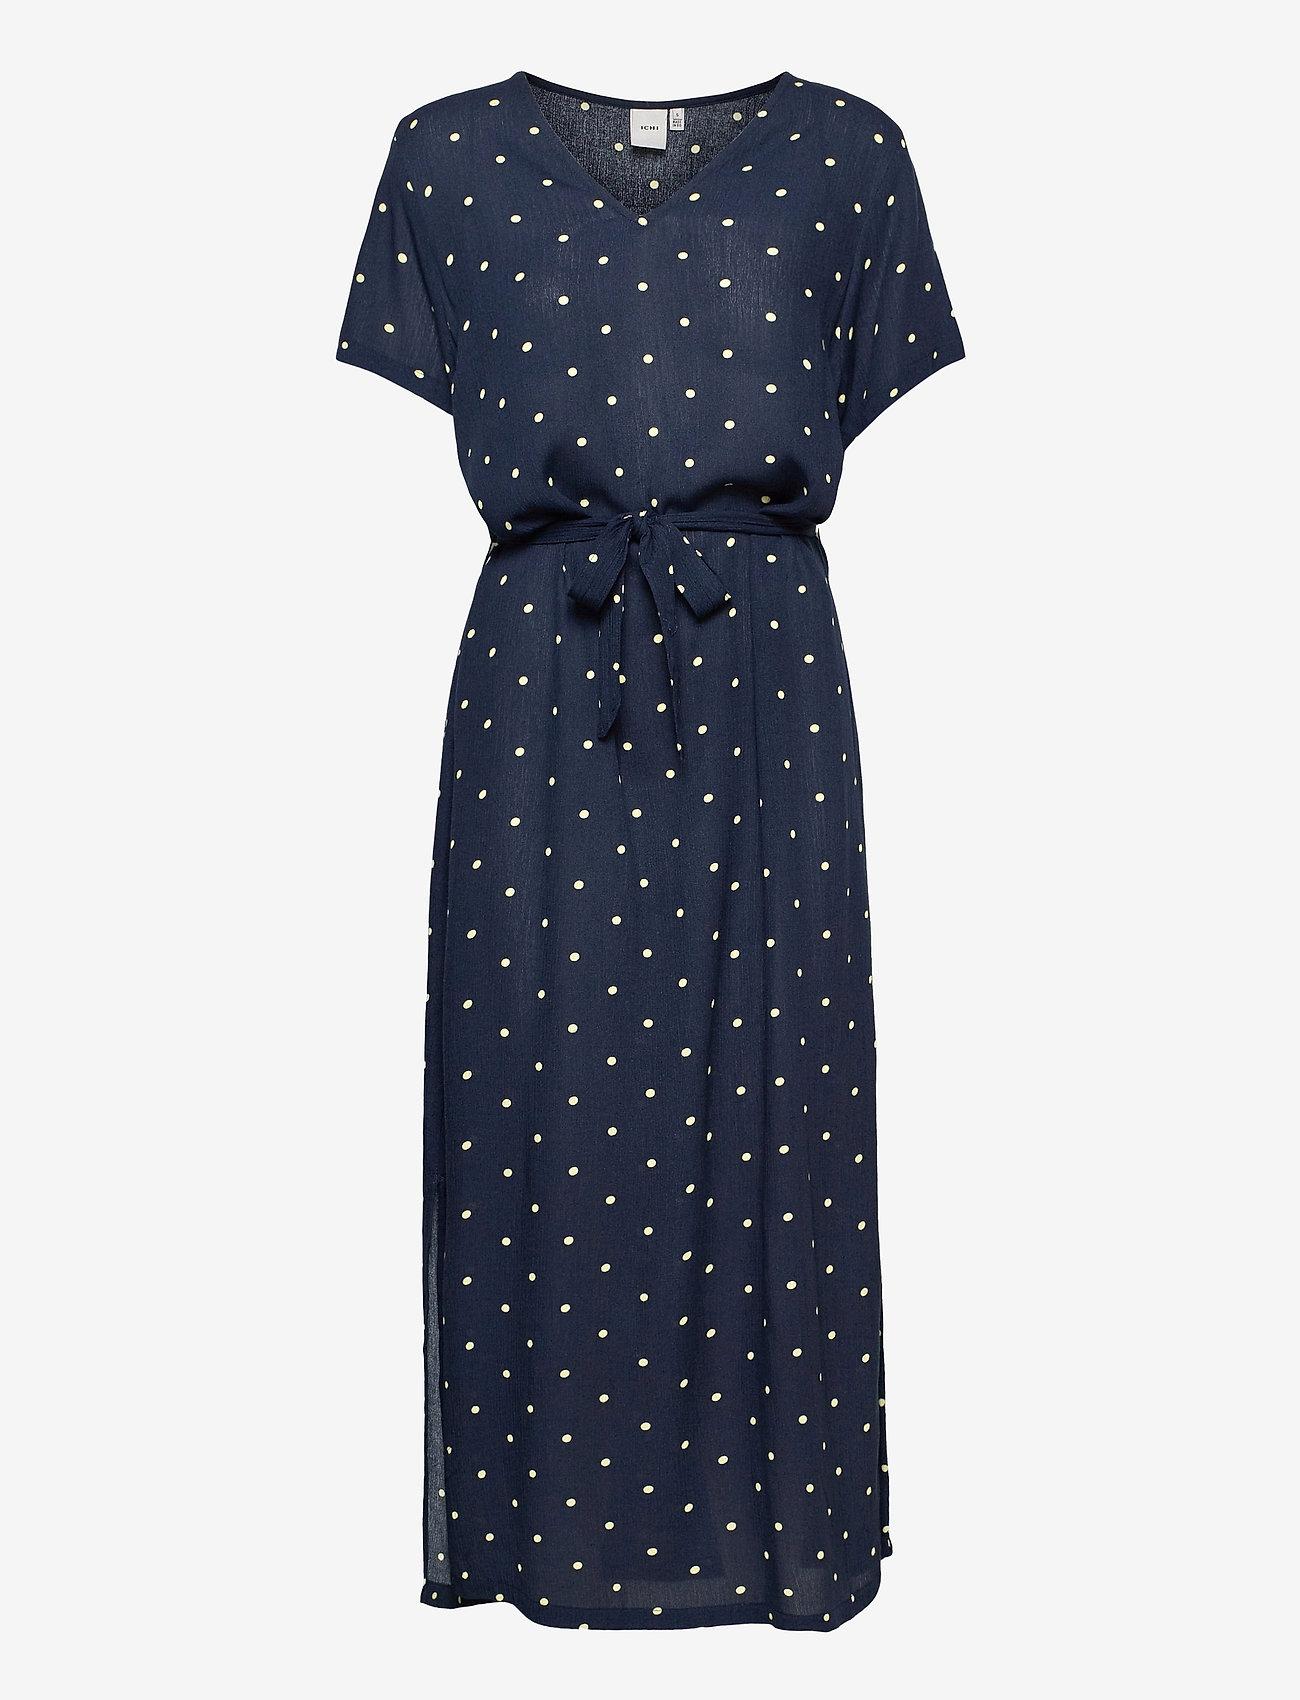 ICHI - IHMARRAKECH AOP DR - midi dresses - total eclipse dot - 0